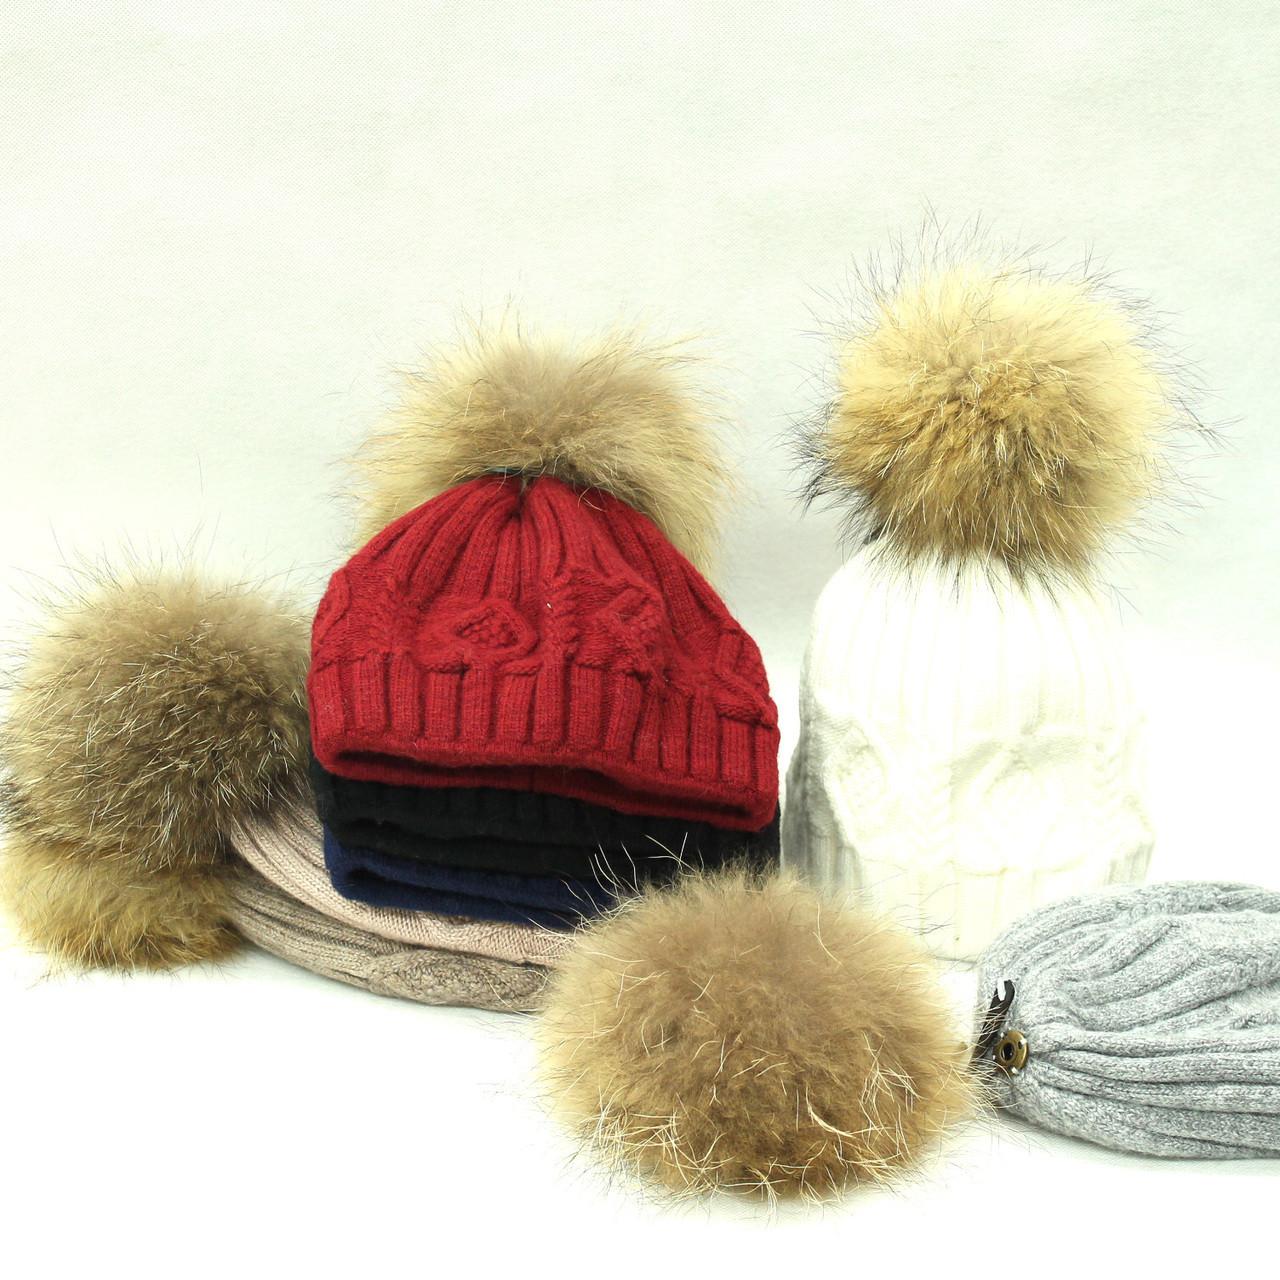 d12106ef6c926 Lady s Real Raccoon Fur Pom Pom Hat (Removable )H212 - Polyfashion Trading  Ltd